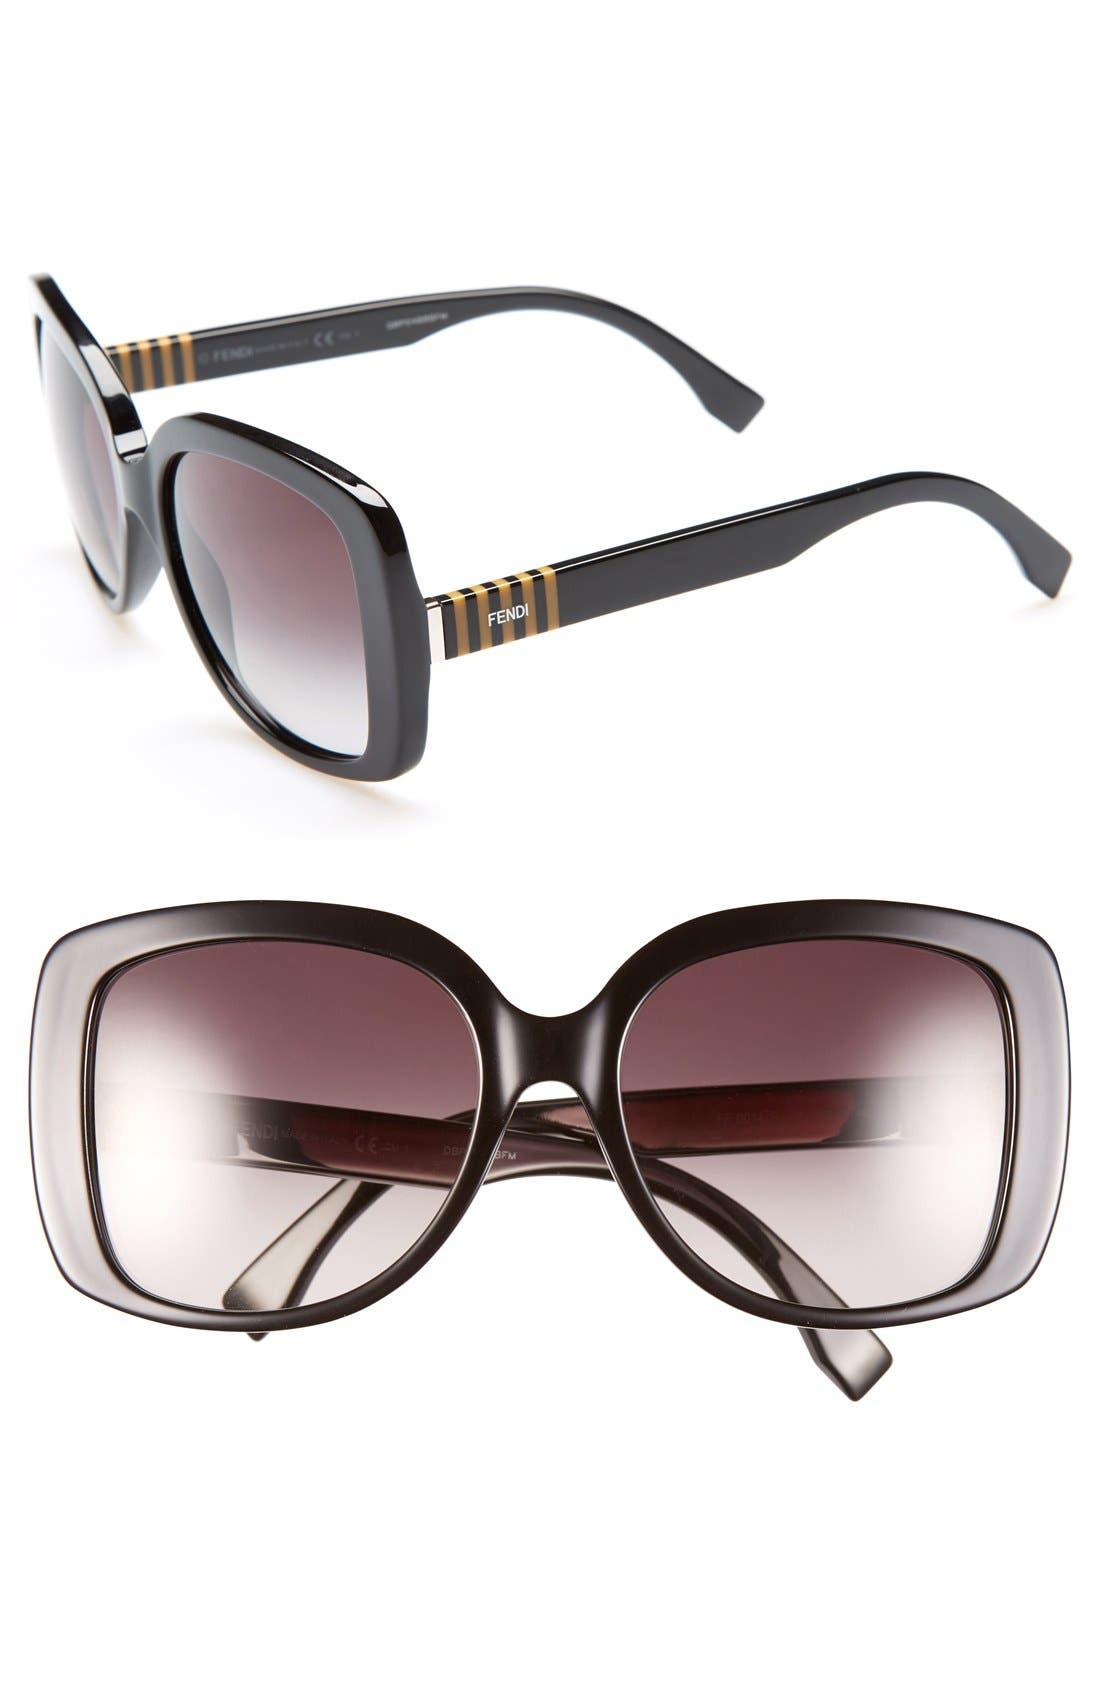 Main Image - Fendi 55mm Retro Sunglasses